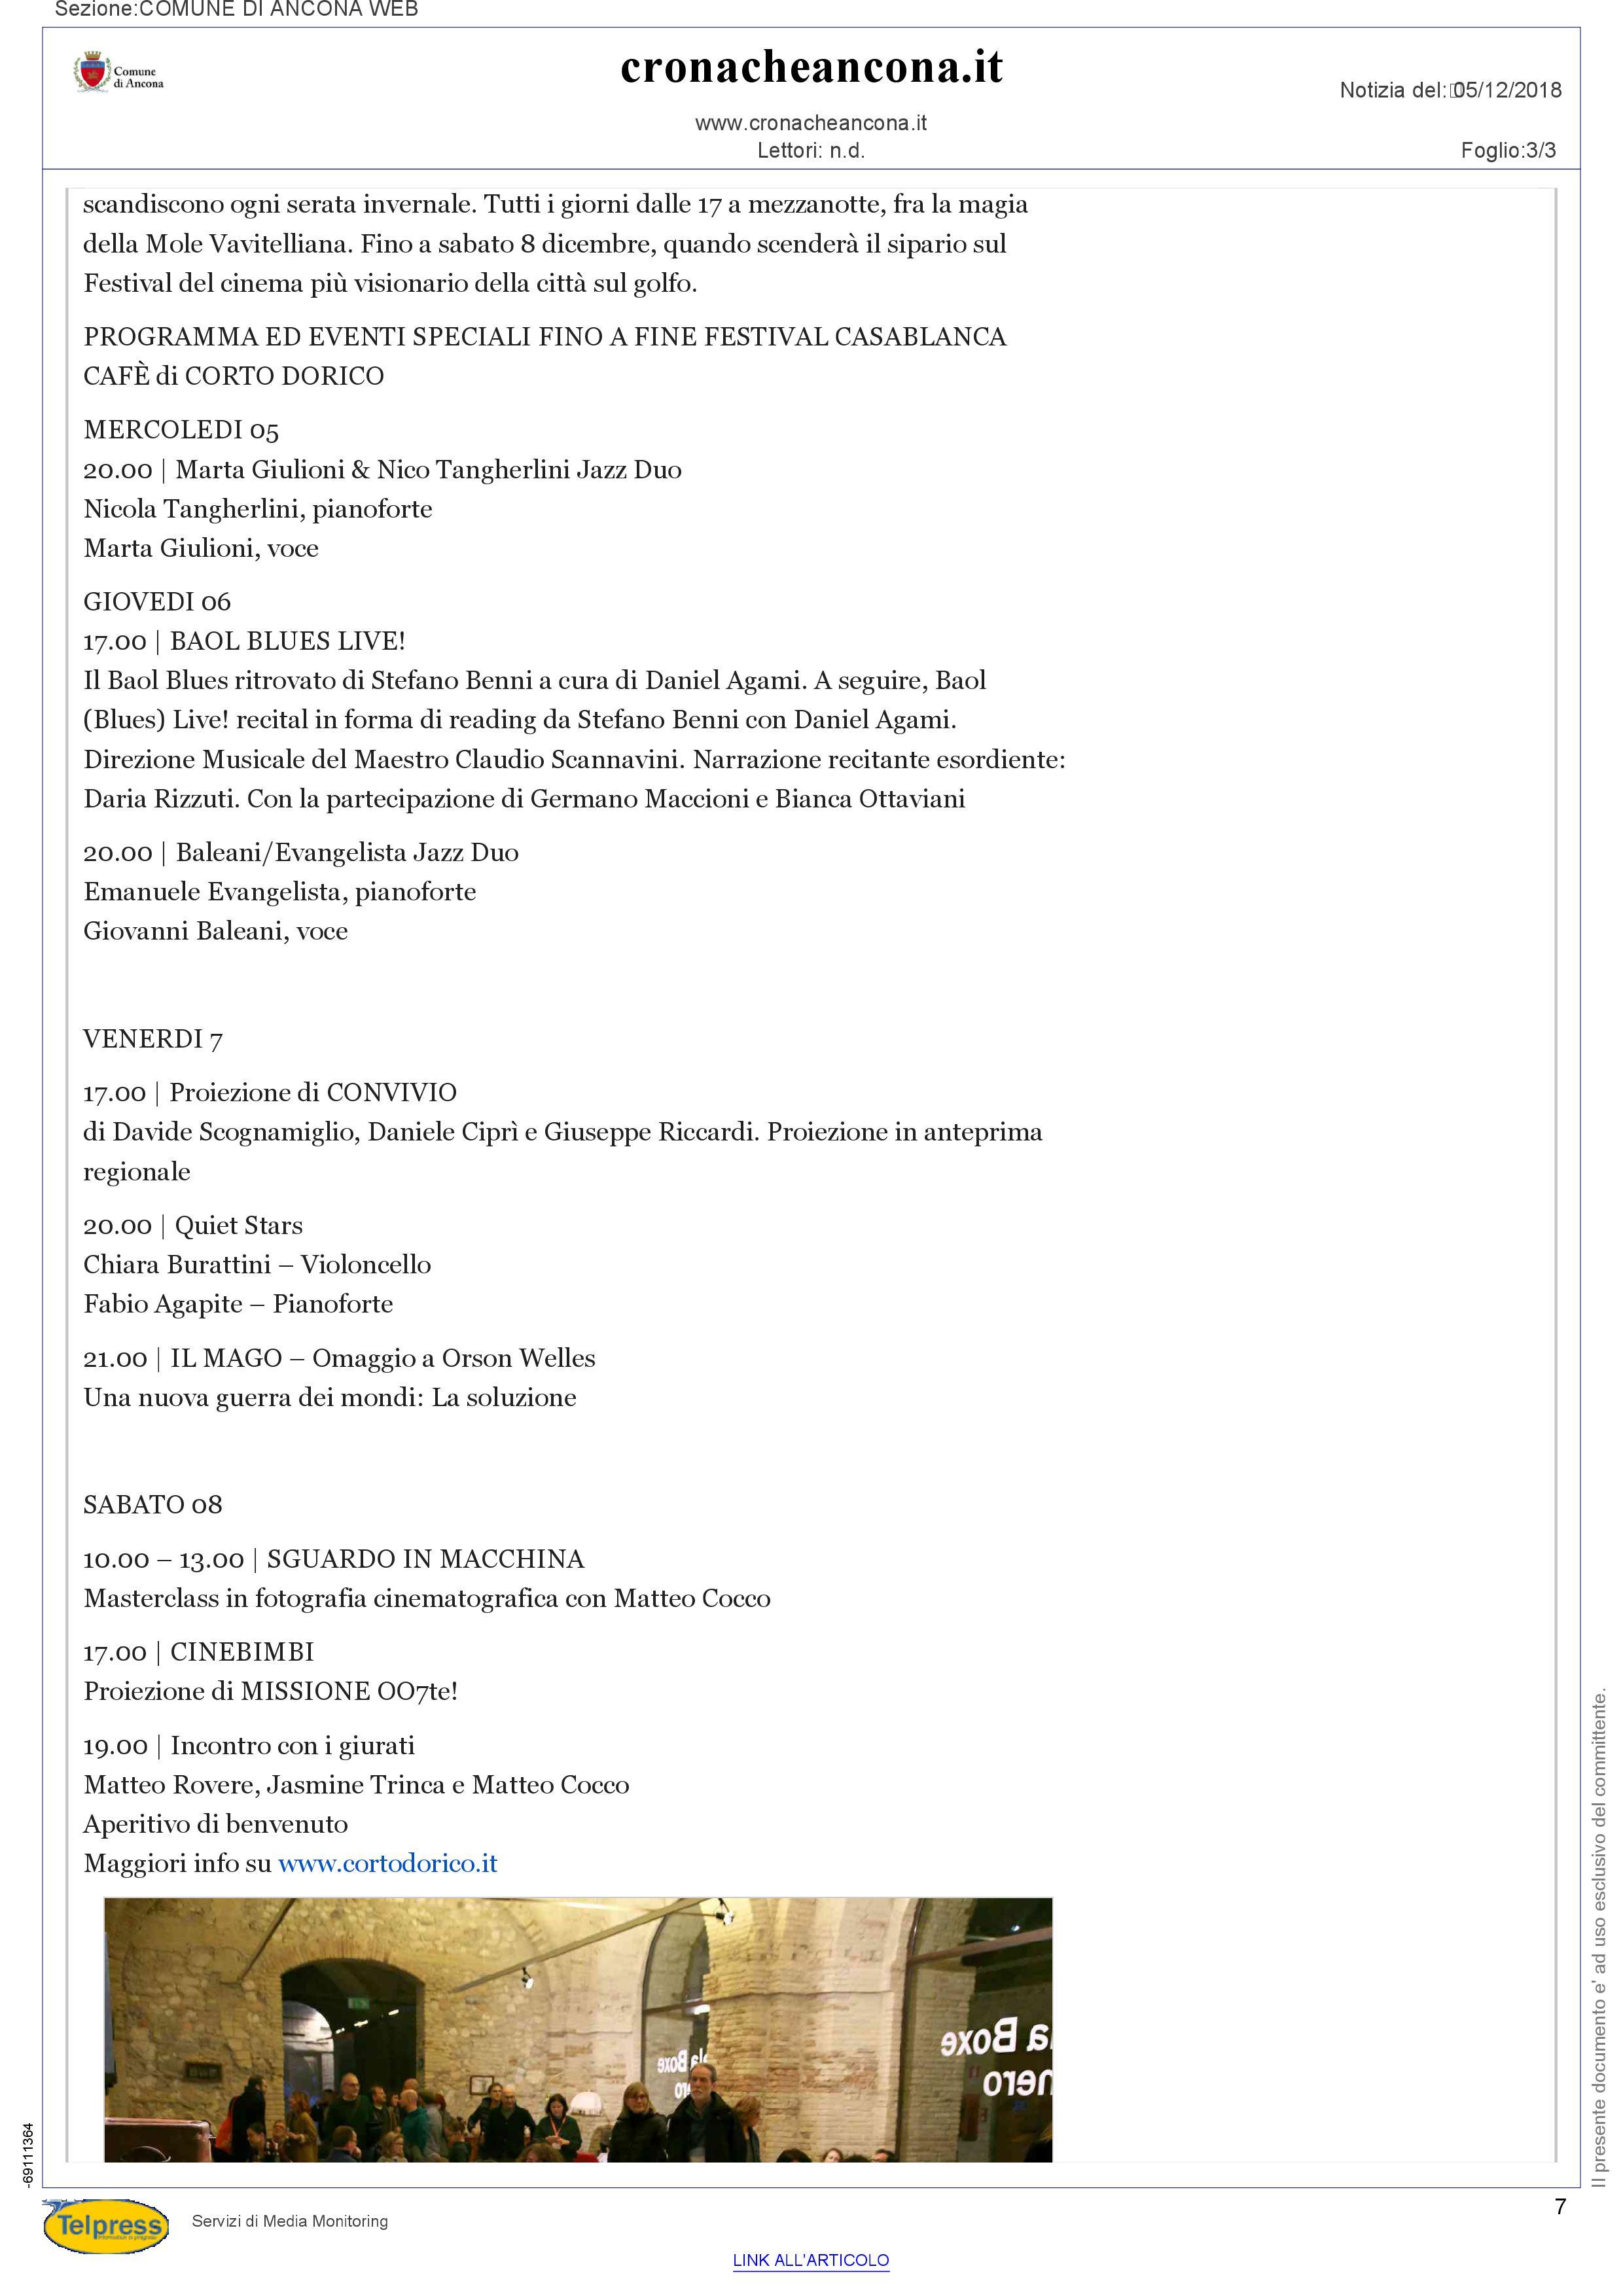 5-12-18 Cronache Ancona pag 3